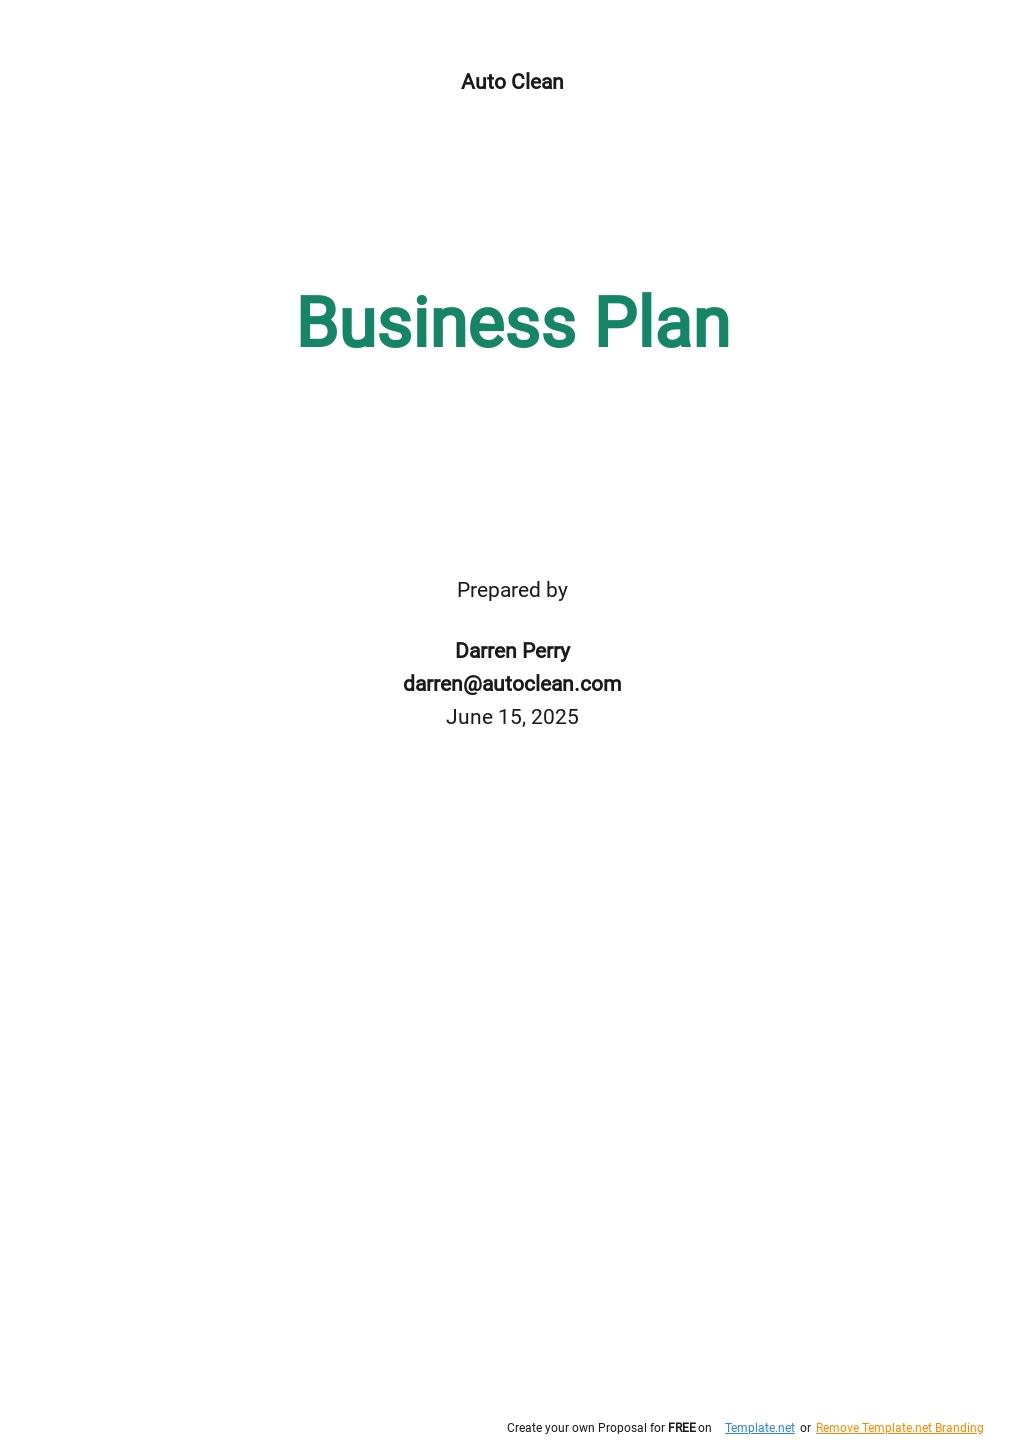 Car Wash Business Plan Template.jpe